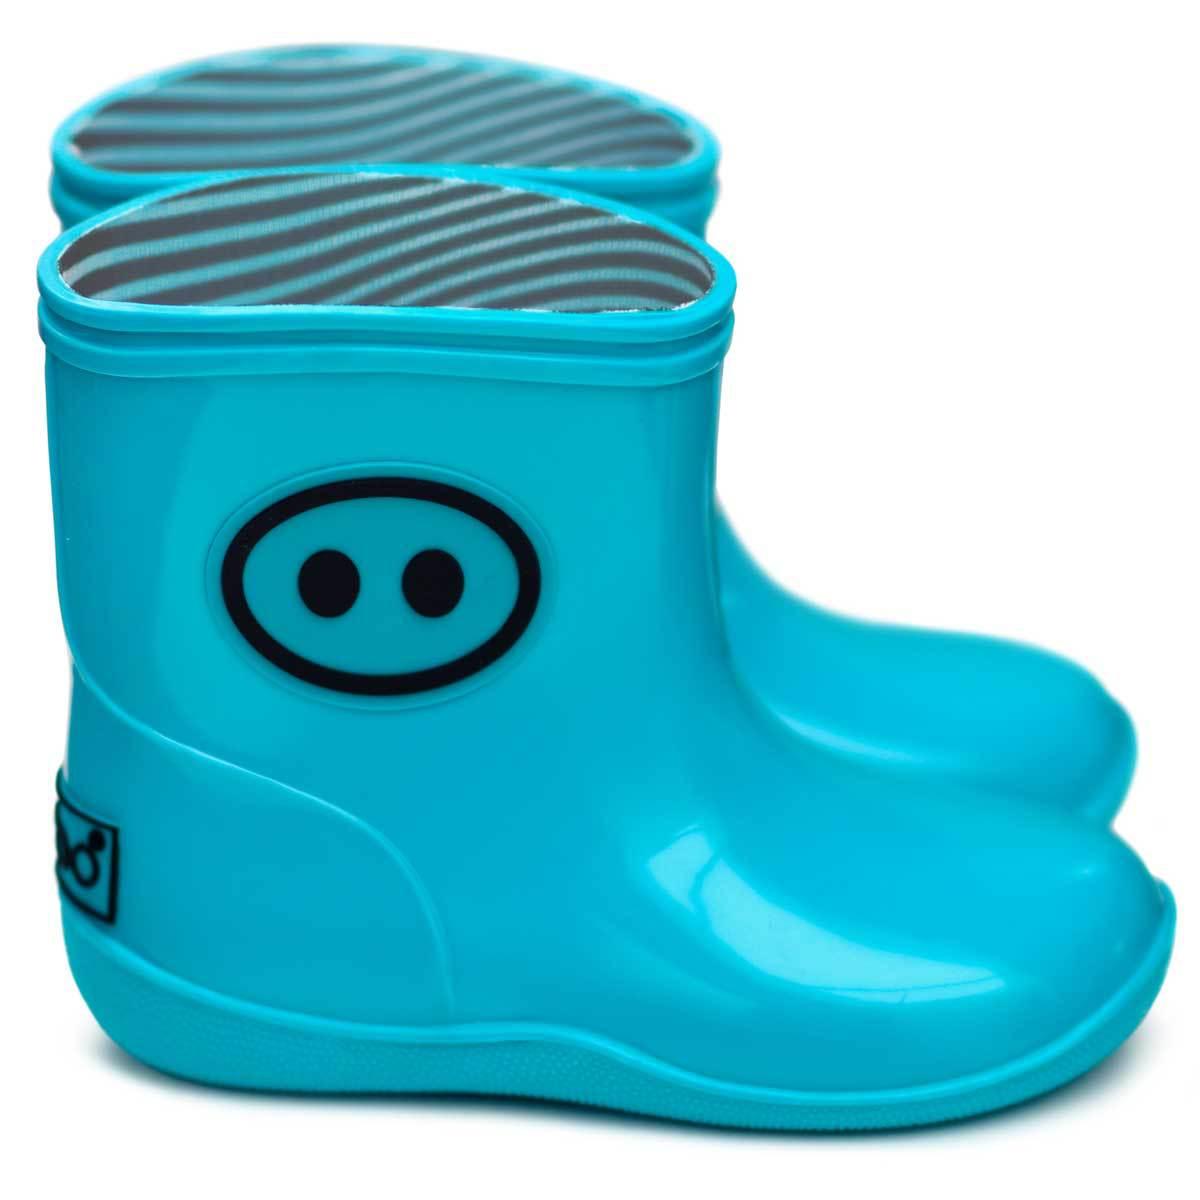 Chaussons & Chaussures Bottines Kawaï Bleu - 21/22 Bottines Kawaï Bleu - 21/22